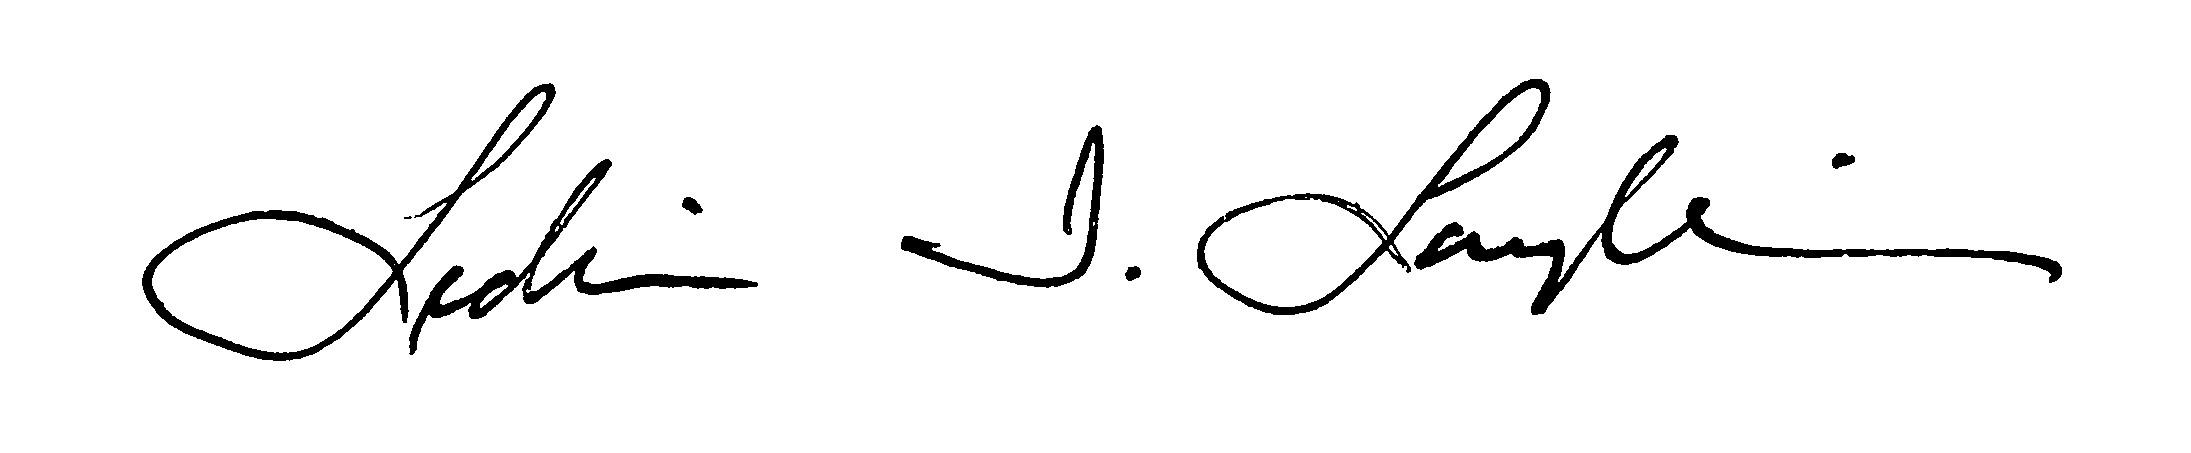 ledlie-signature_955